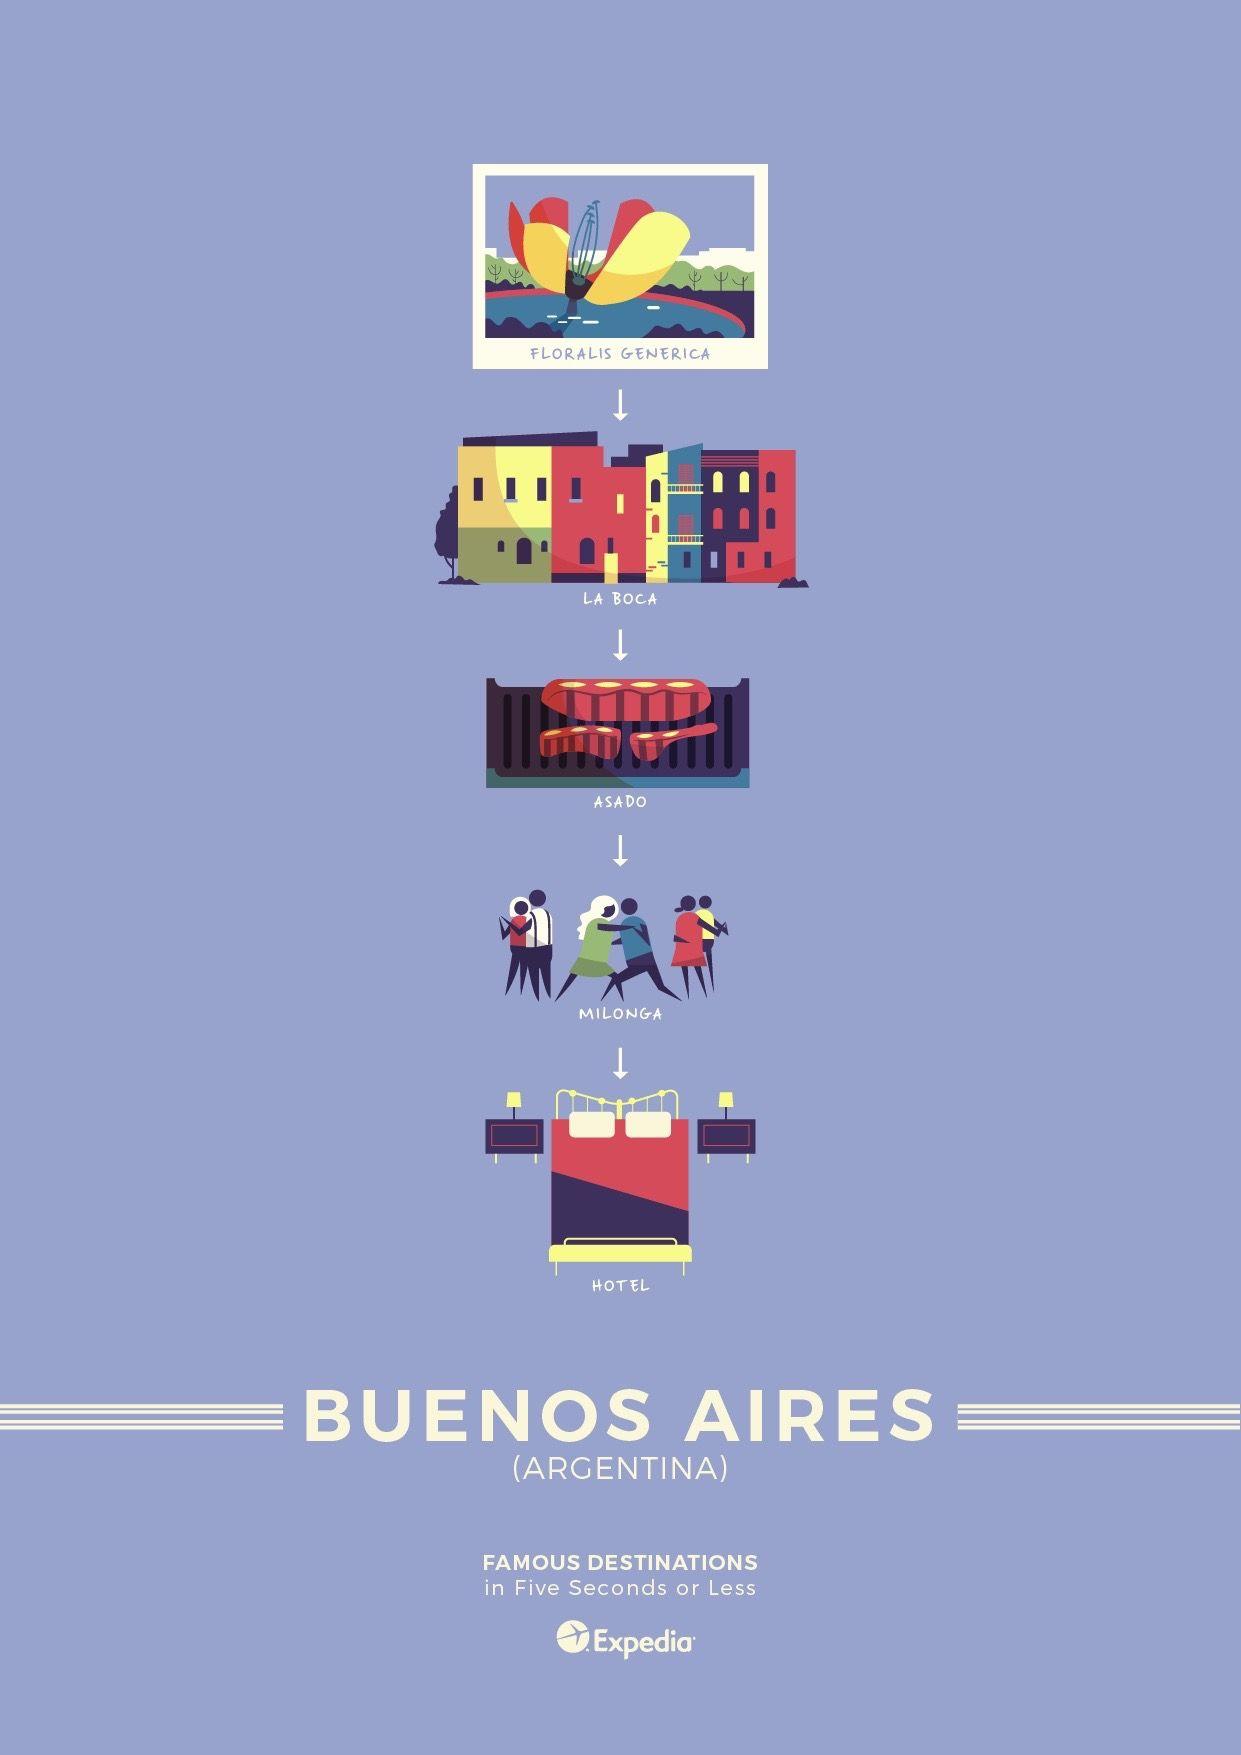 02_Buenos-Aires top destinations